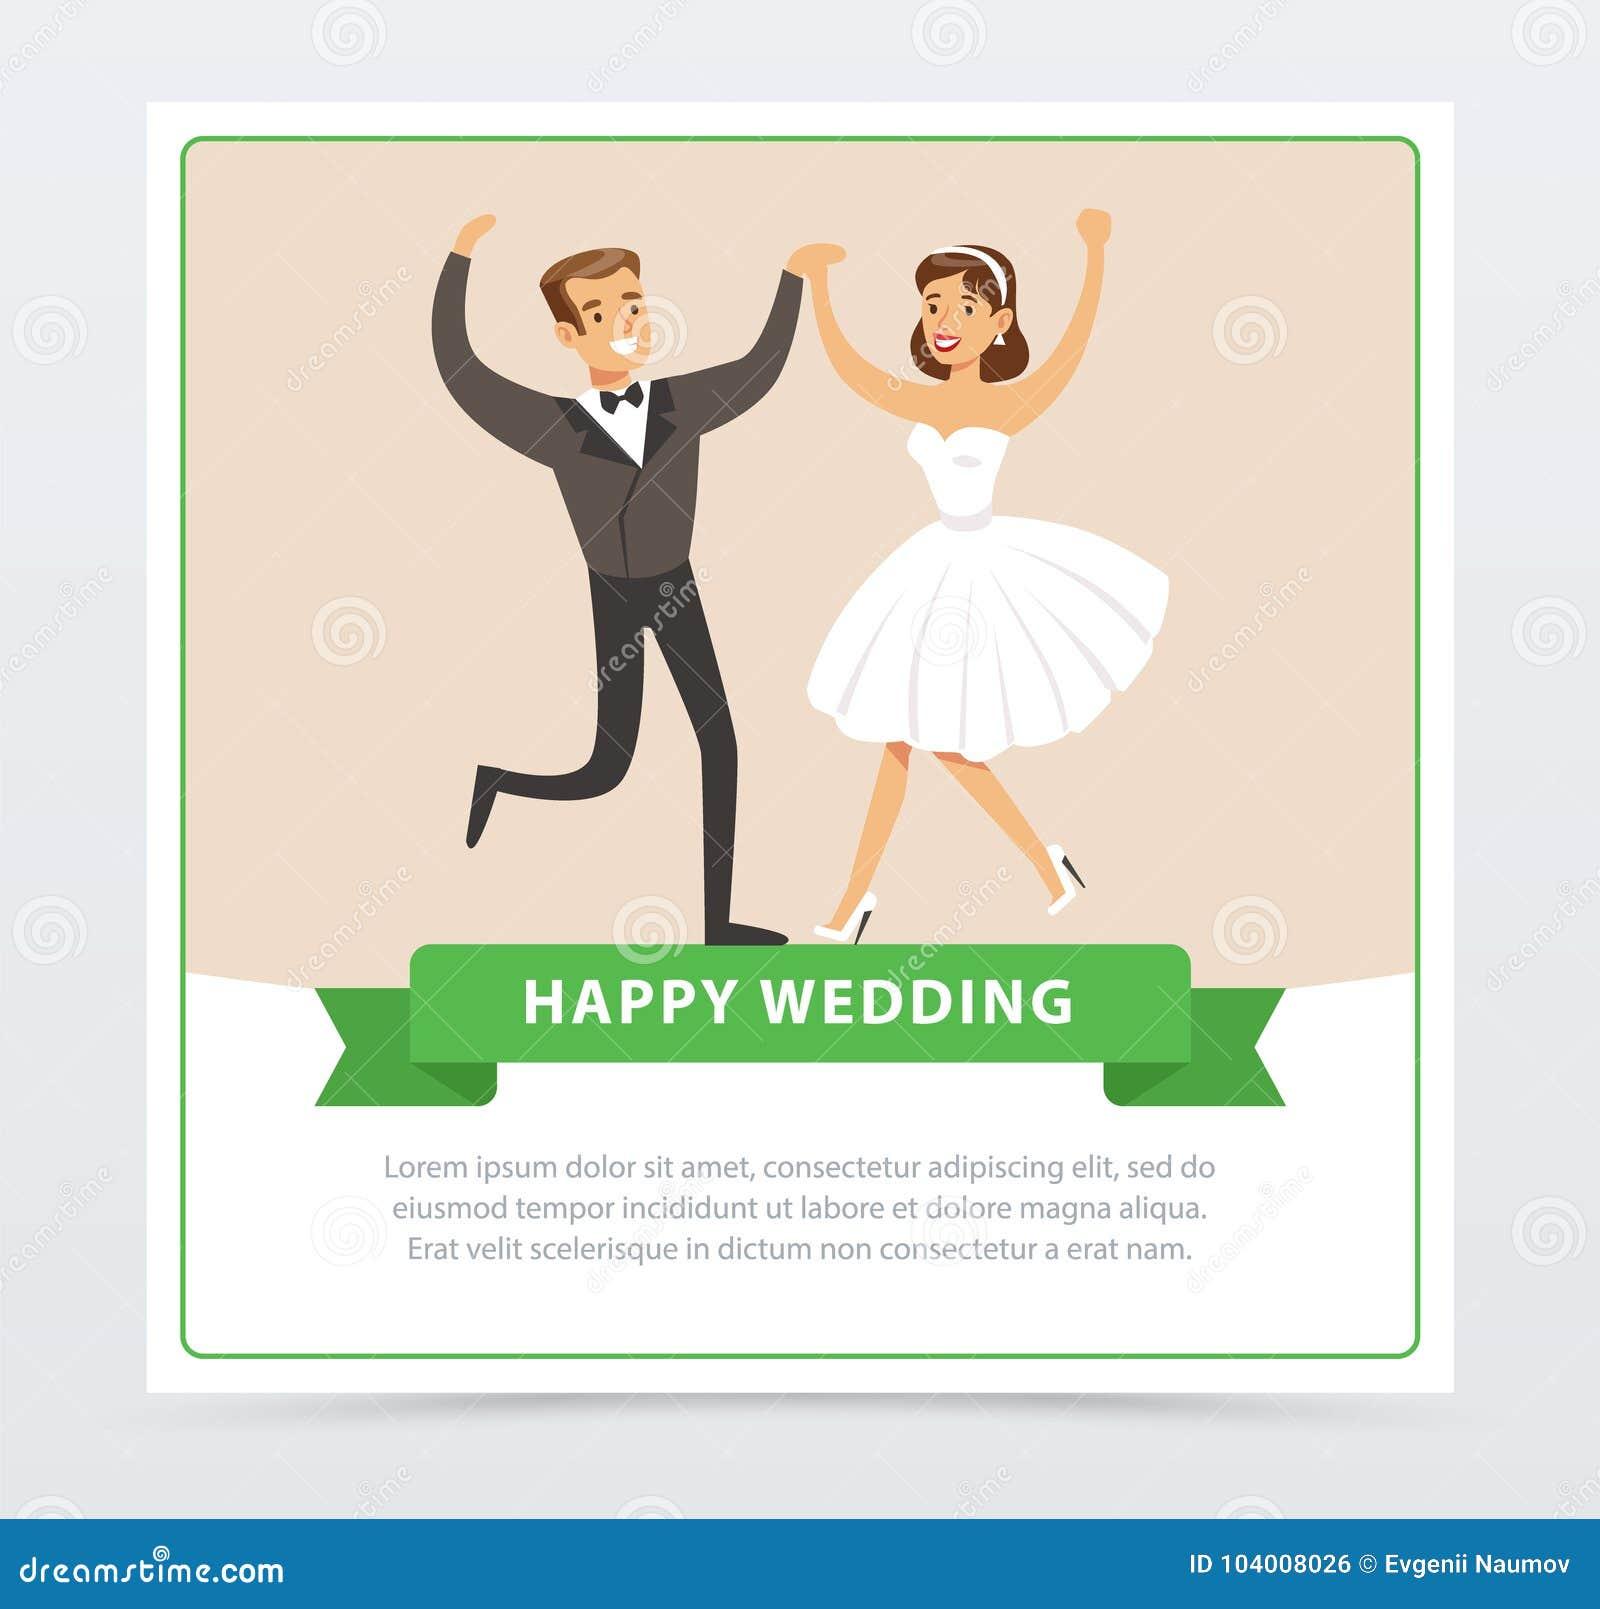 Sweet Just Married Couple Dancing, Happy Wedding Banner